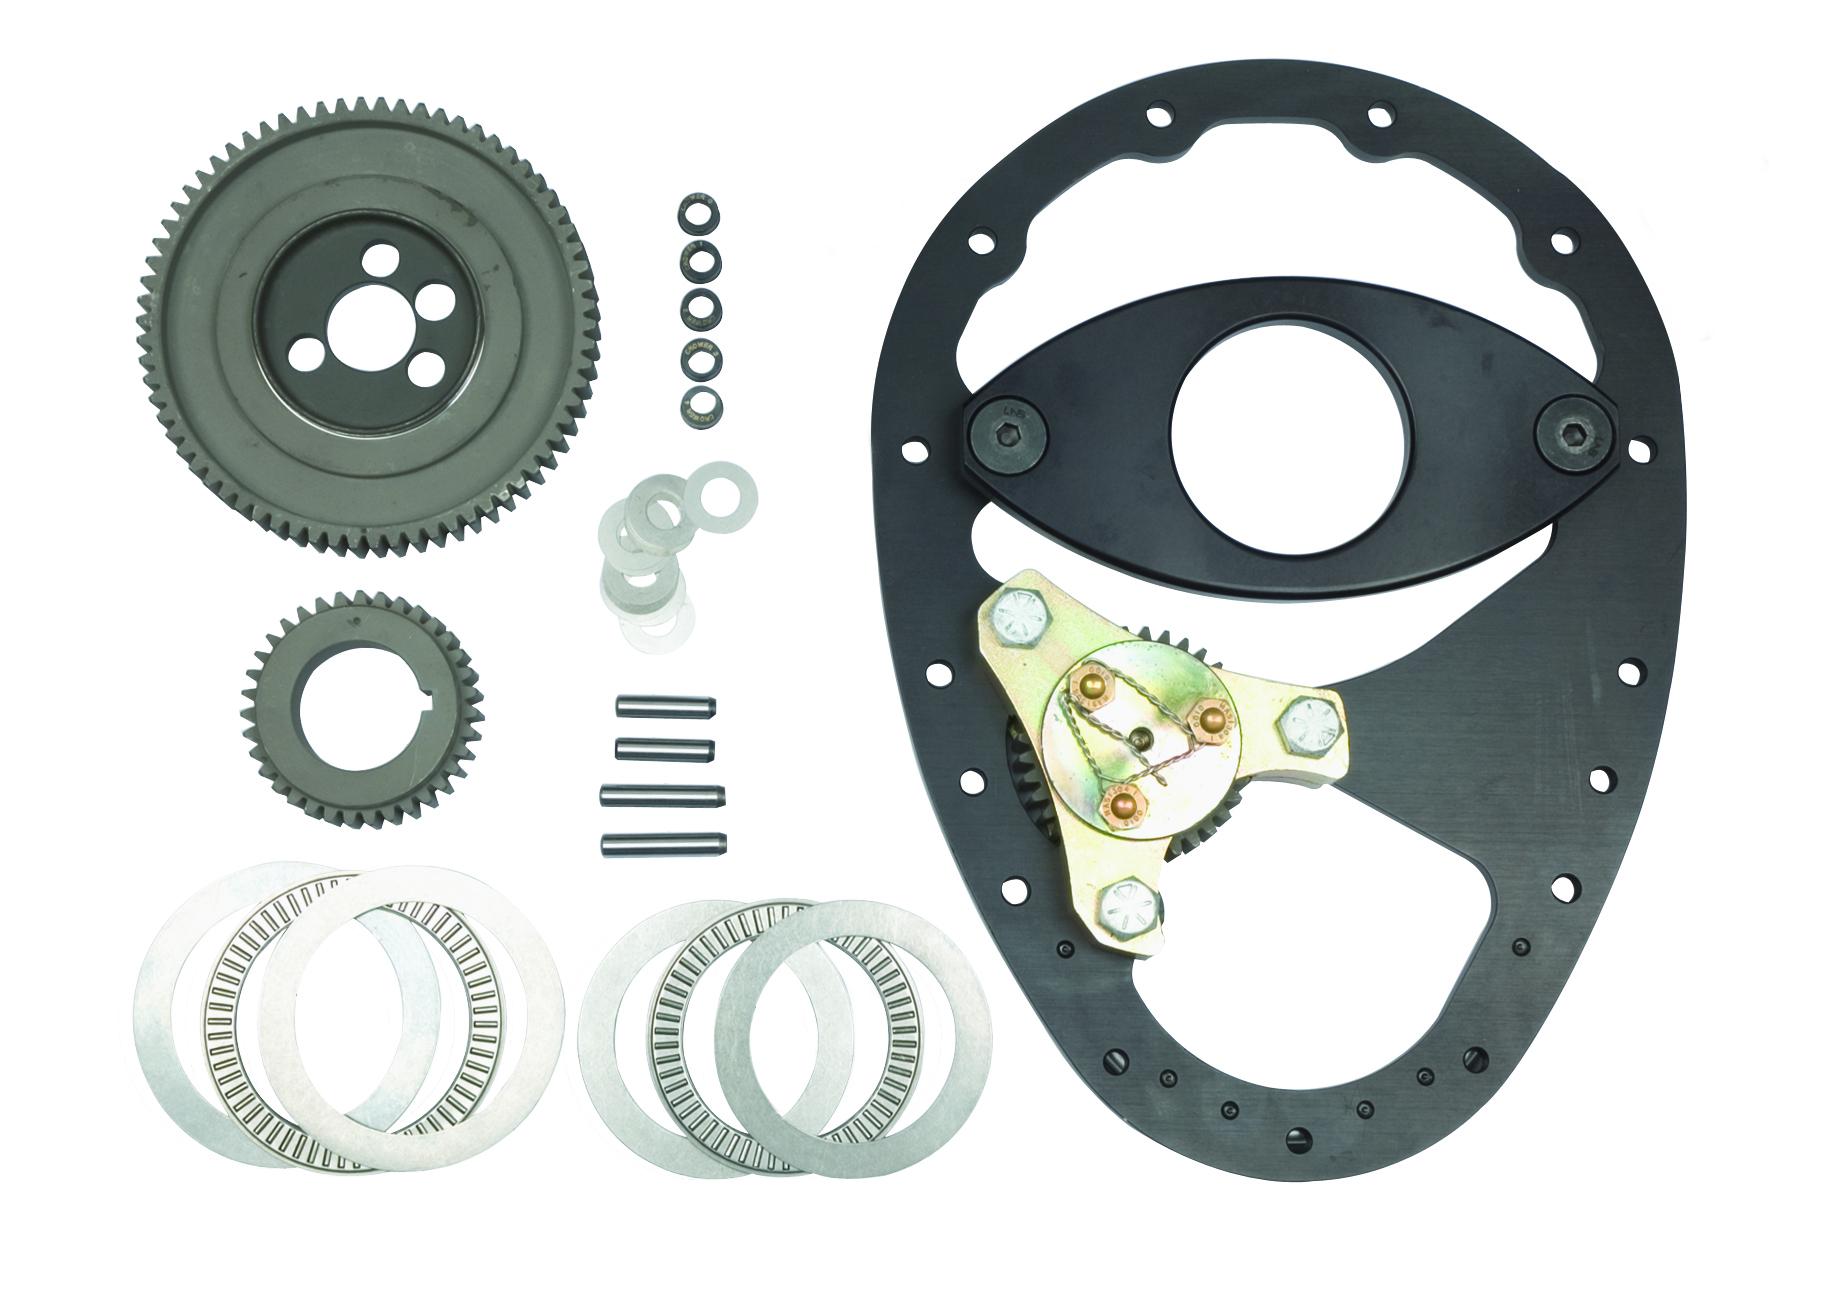 Allstar Performance 90000 Timing Gear Drive, 3 Gear Drive, Fixed Idler Gear, Aluminum Plate / Steel Gears, Small Block Chevy, Kit